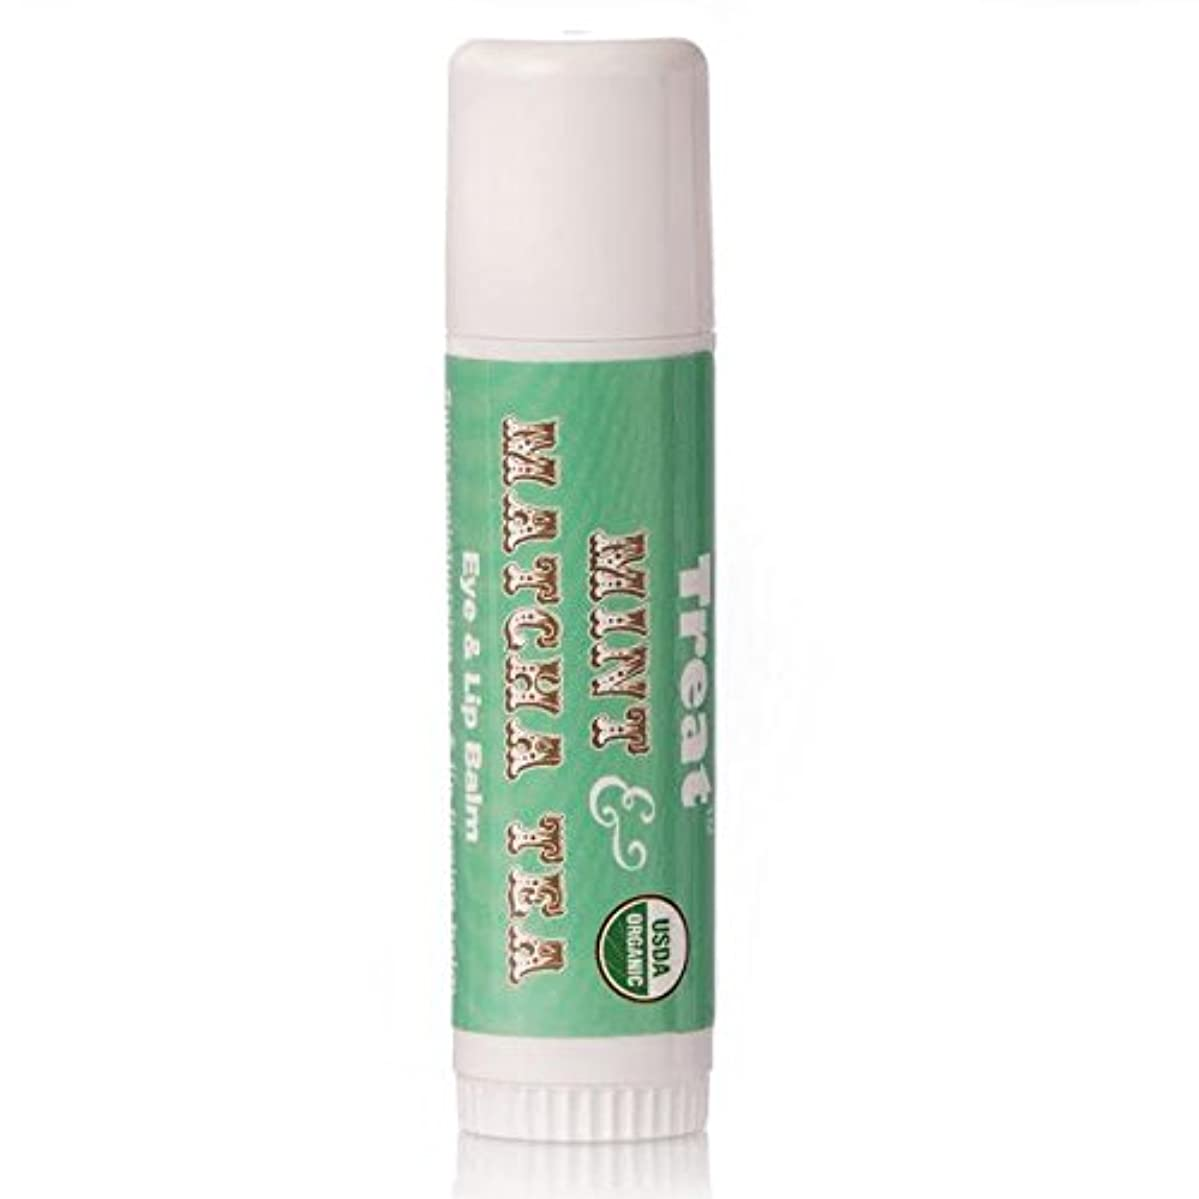 TREAT Jumbo Lip Balm - Mint & Matcha Tea Eye & Lip Balm, Organic & Cruelty Free (.50 OZ)